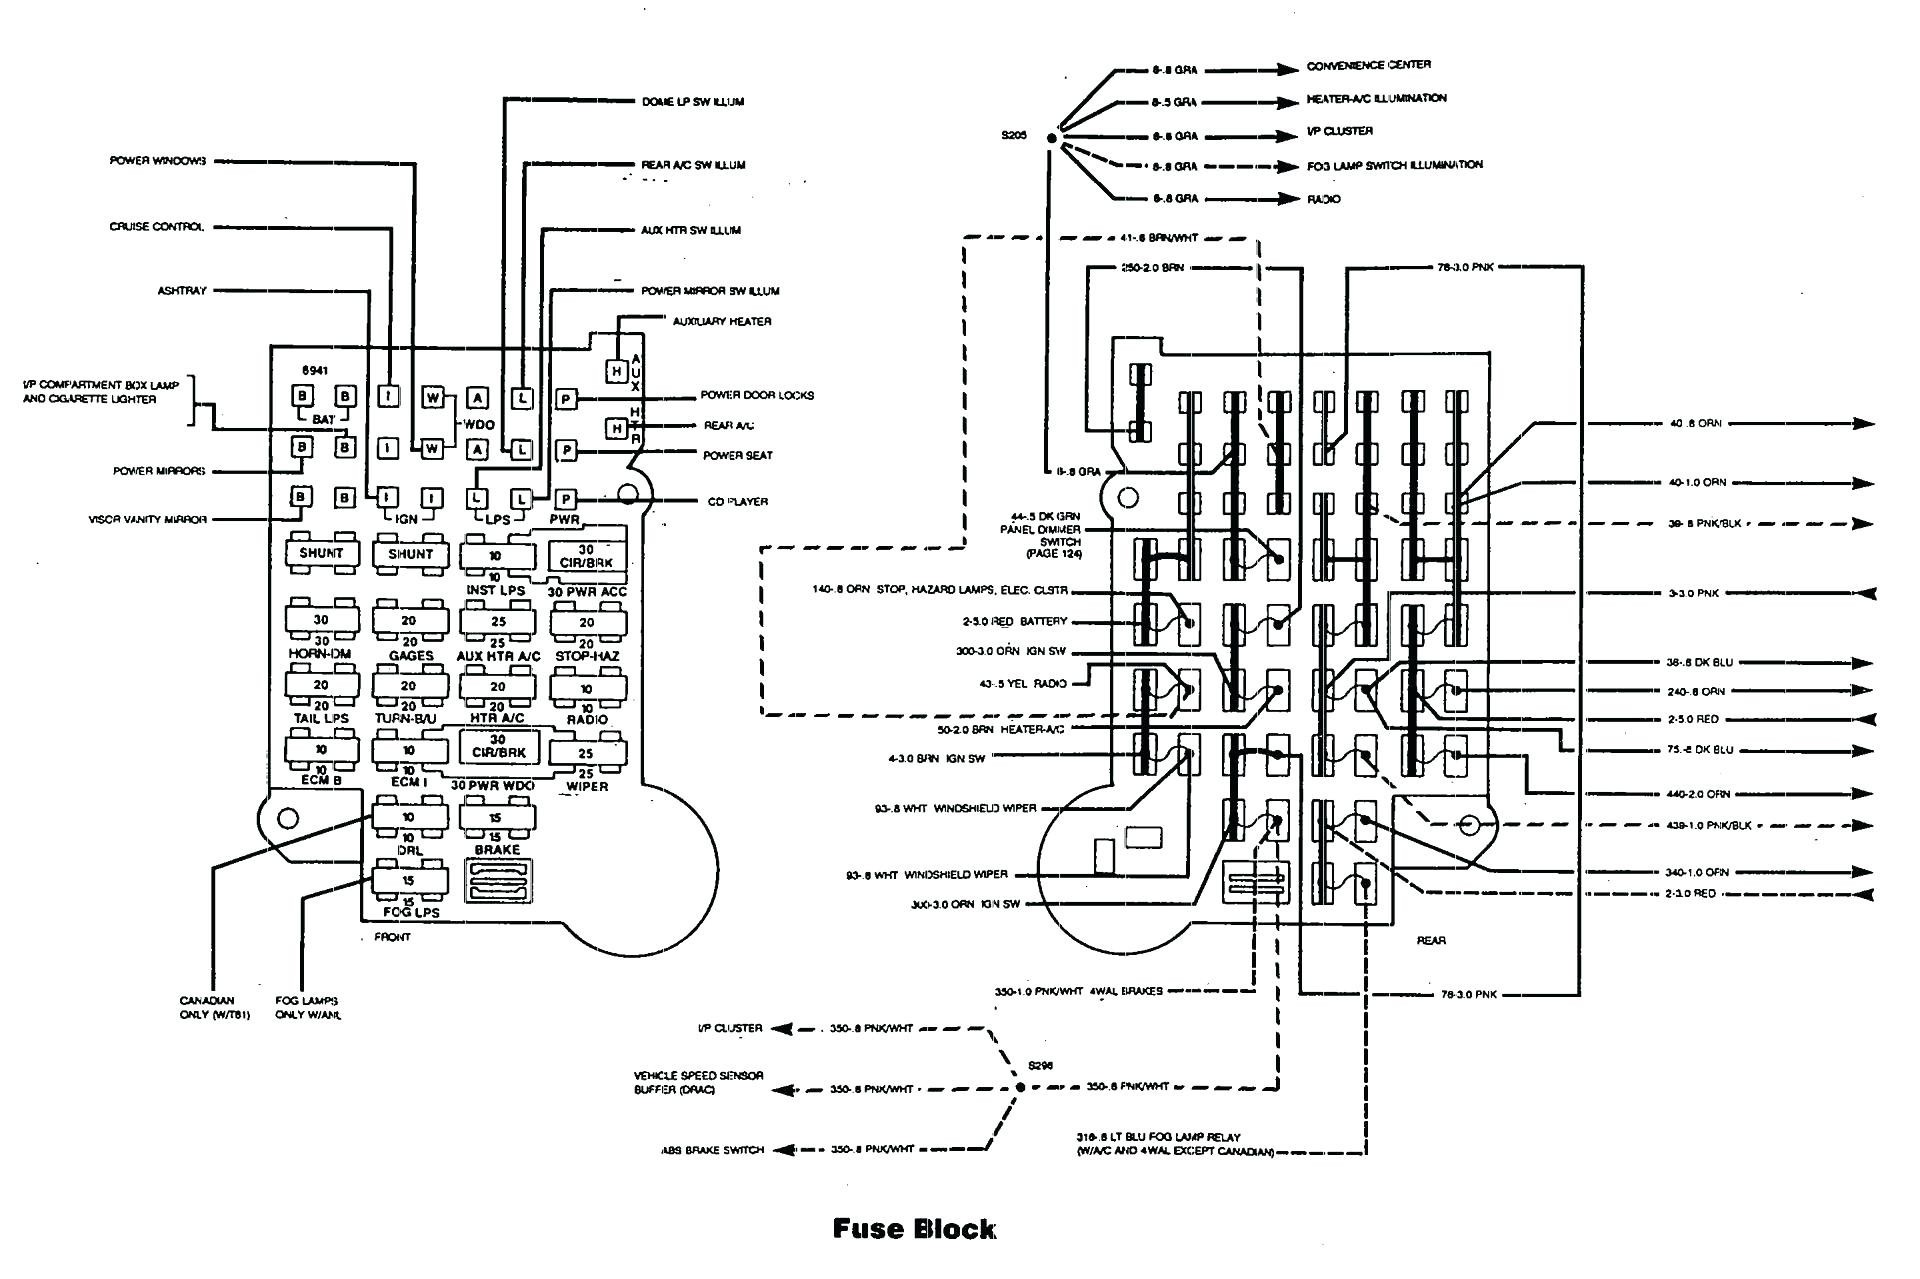 2002 mitsubishi eclipse wiring diagram label the eye answers engine 1997 galant medium resolution of igniter library thunderheart ignition